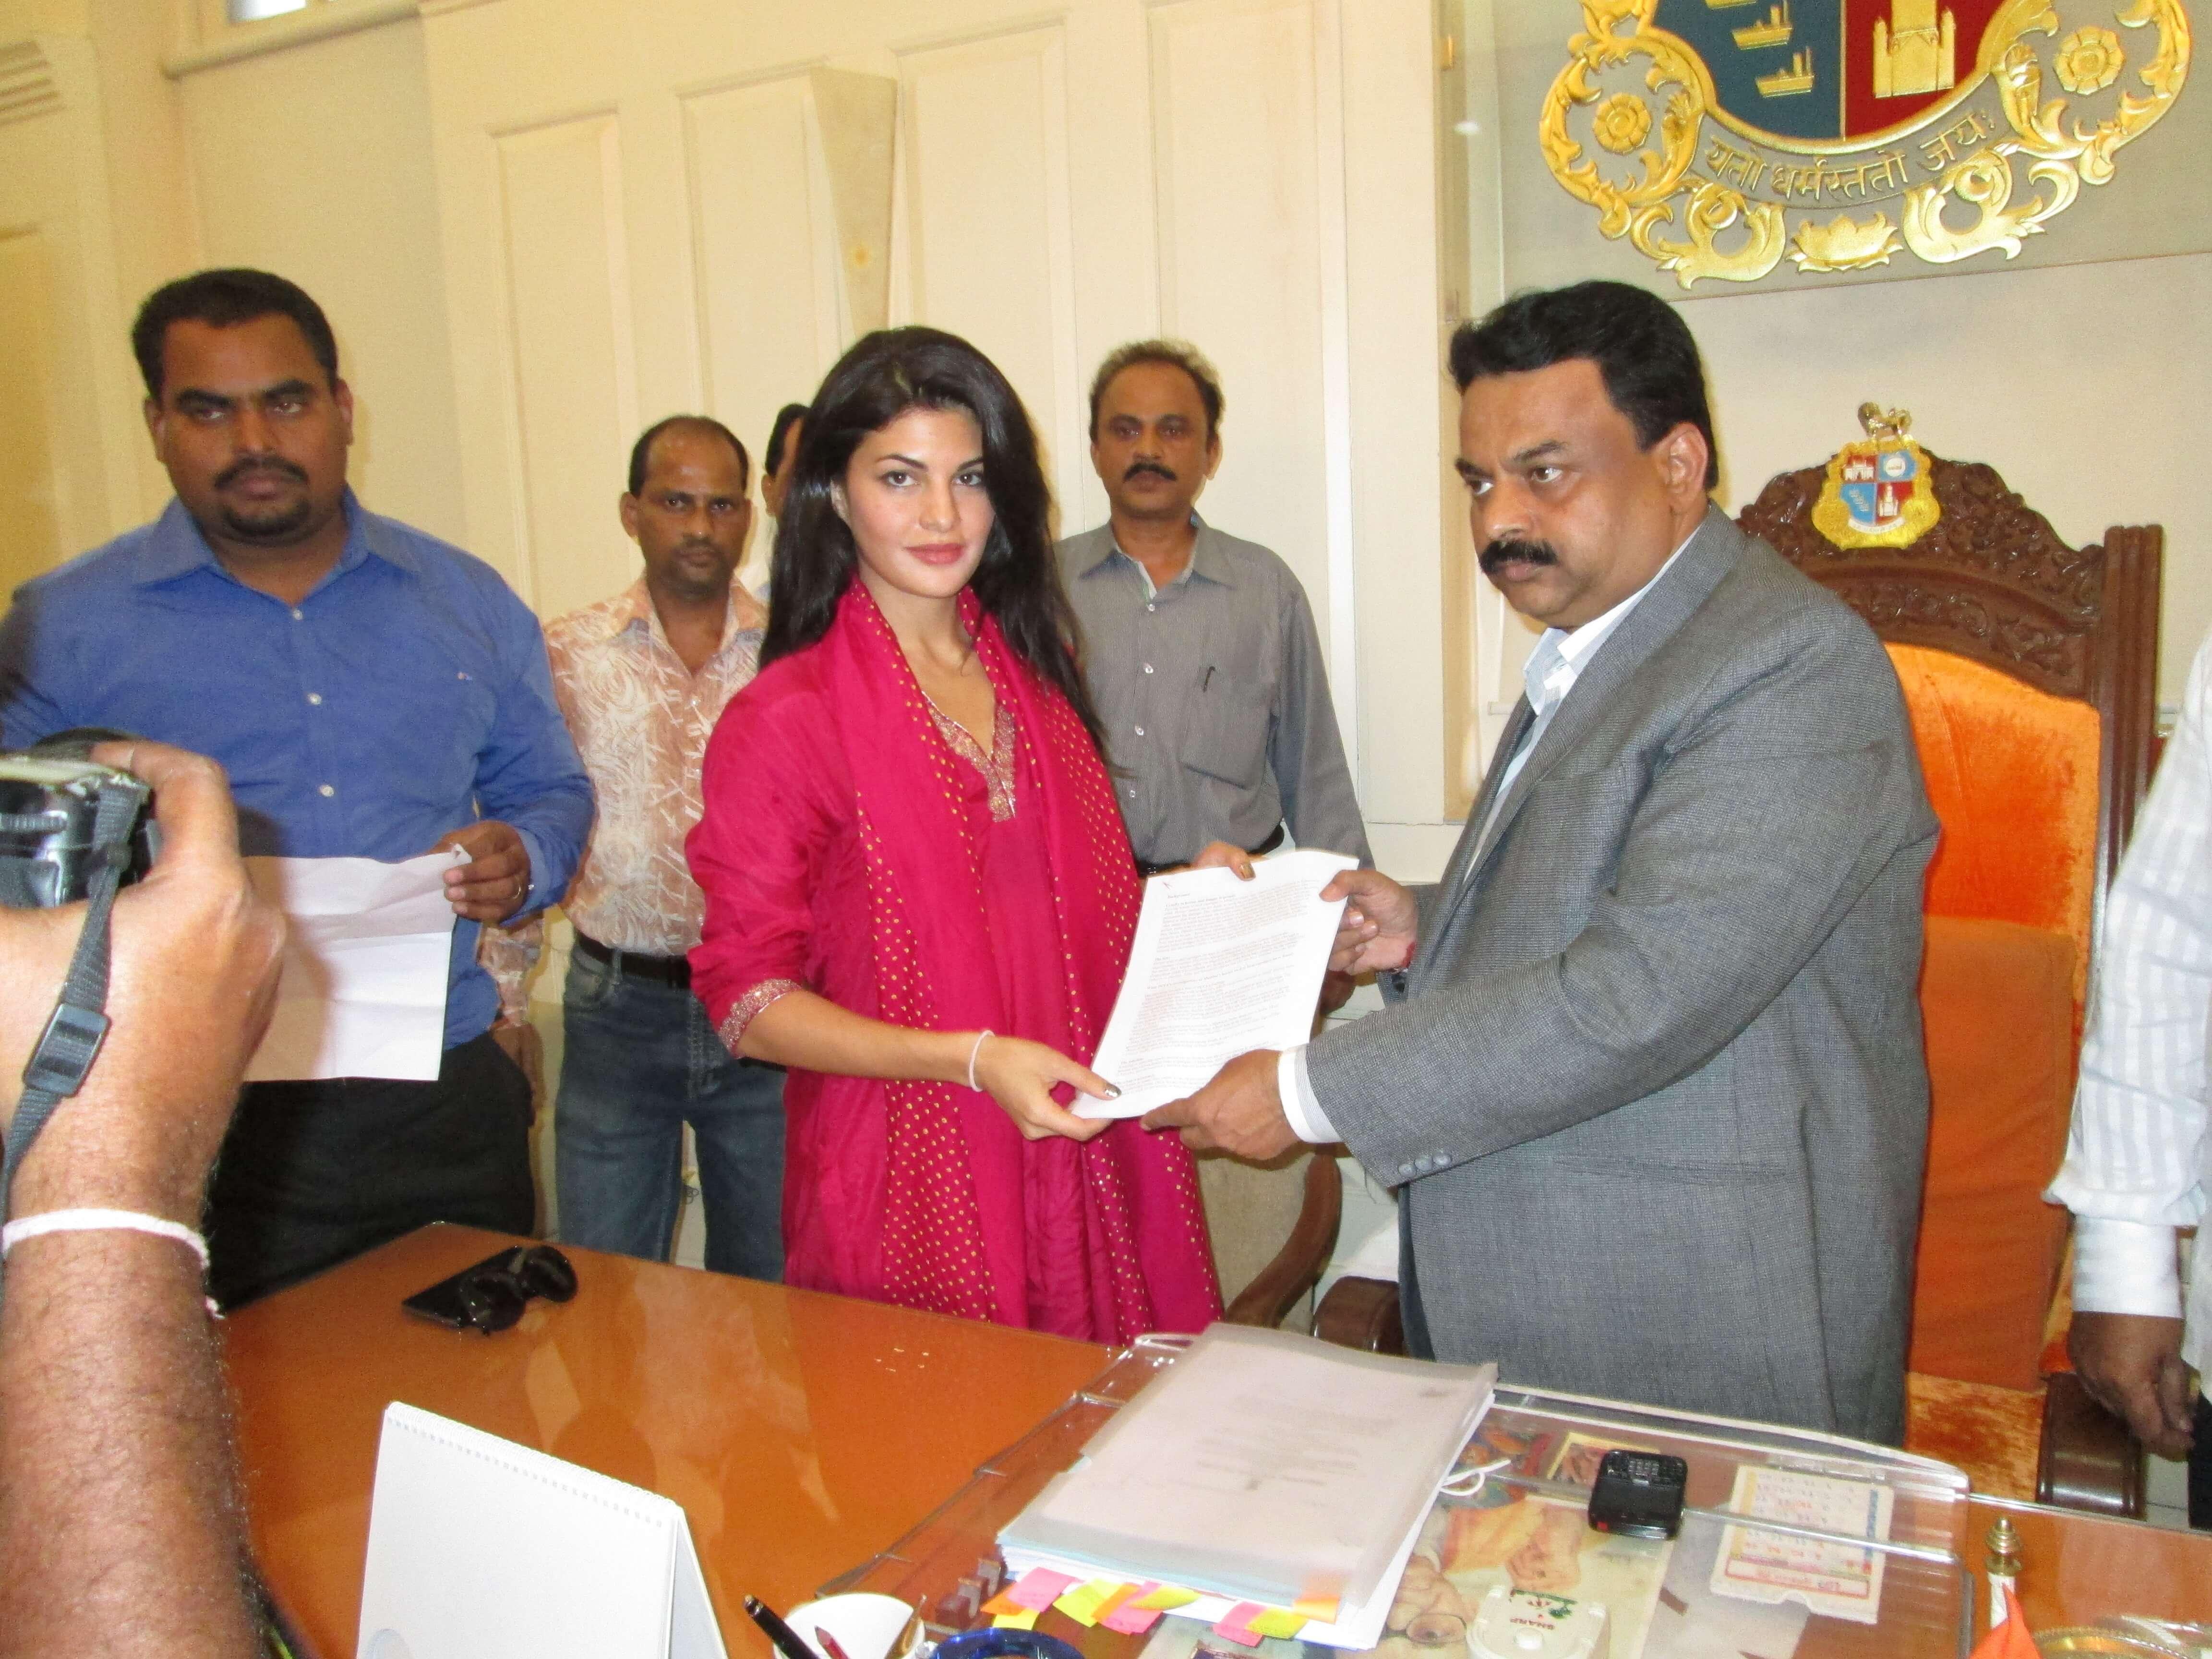 Dr Manilal Valliyate, PETA's director of veterinary affairs; Jacqueline Fernandez, Bollywood actor and Sunil Prabhu, the Mayor of Mumbai